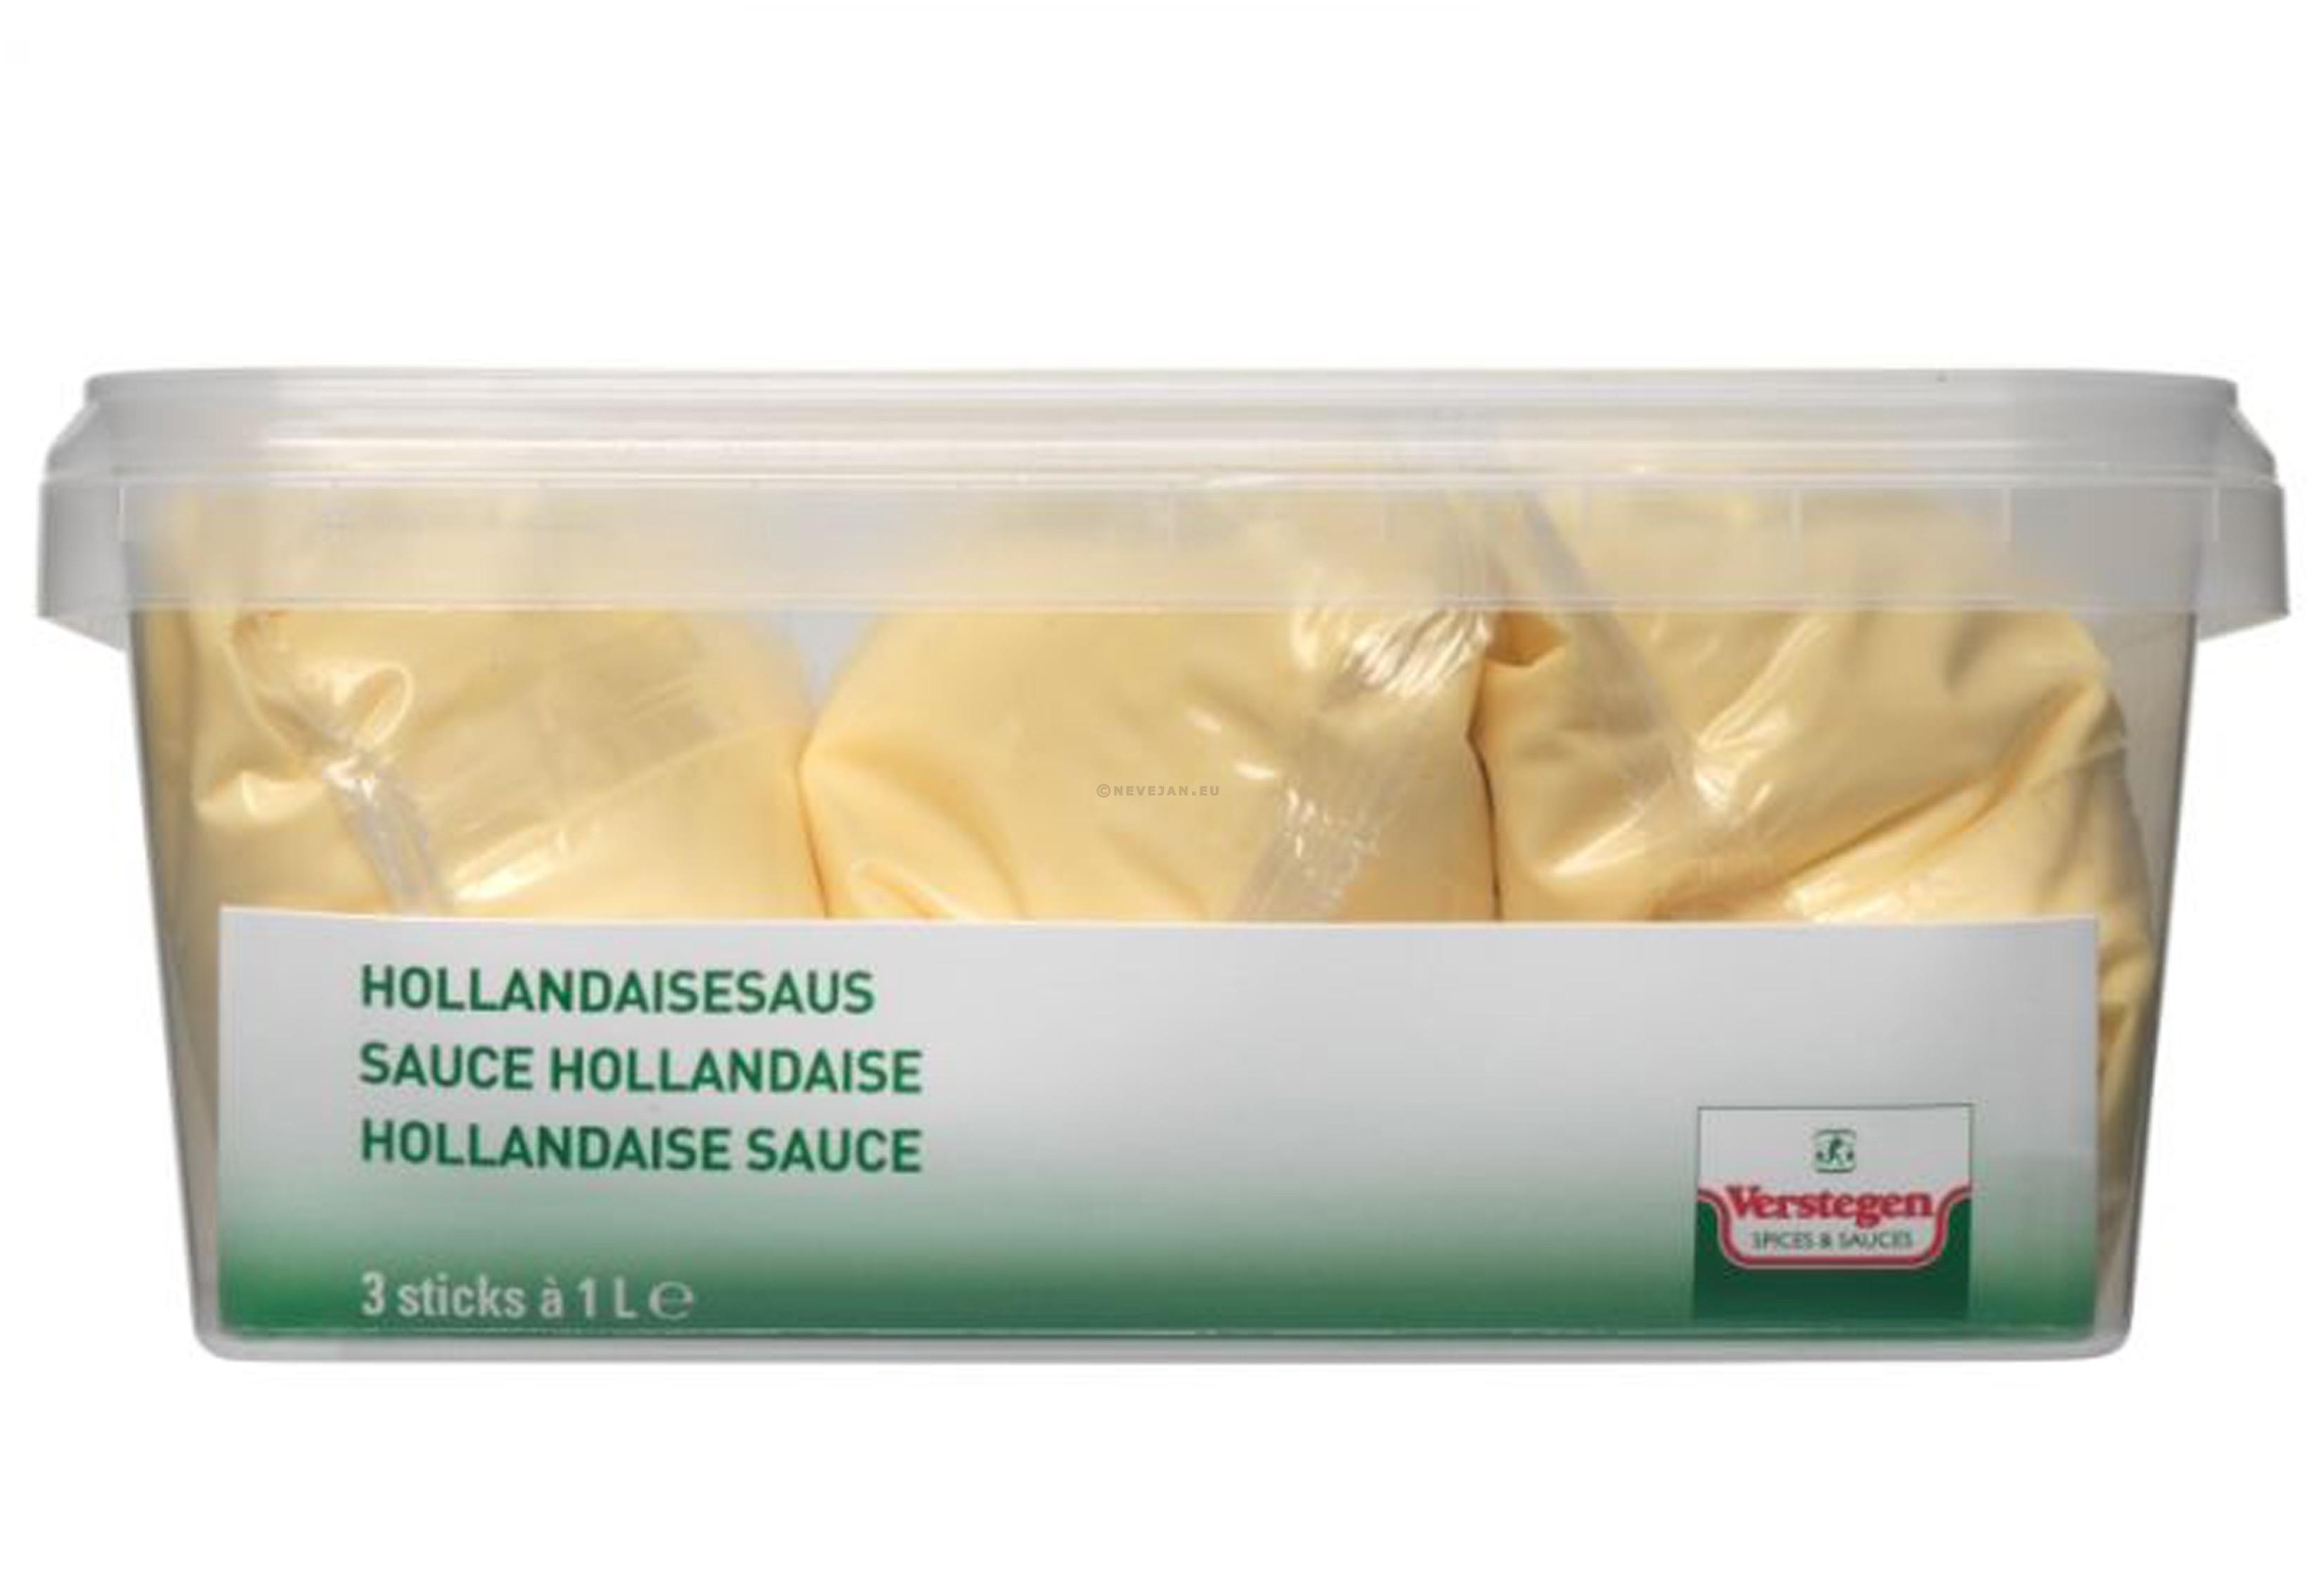 Verstegen sauce hollandaise Warm Up 3x1L (Sauzen)